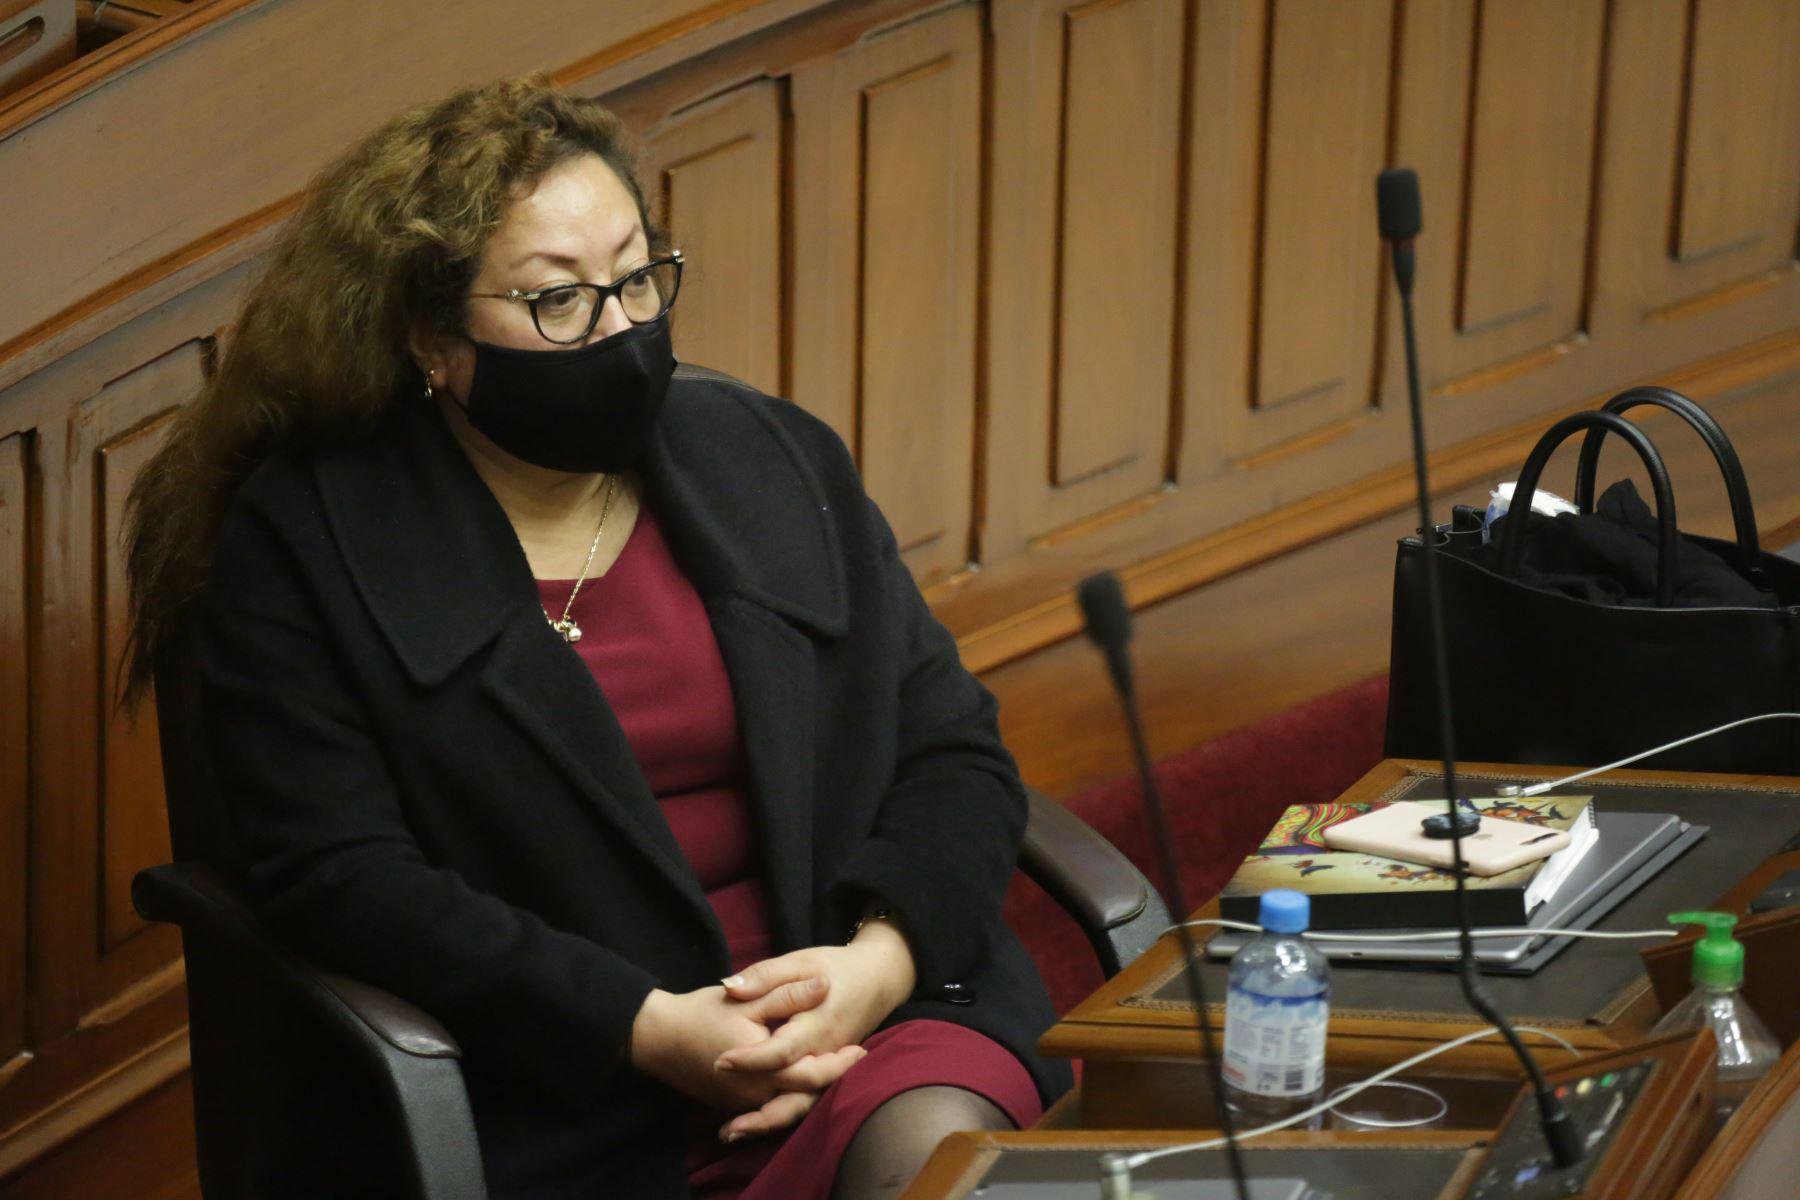 Ministra de Ambiente, Kirla Echegaray, se presenta ante Congreso junto a gabinete ministerial para solicitar voto de confianza. Foto: ANDINA/PCM